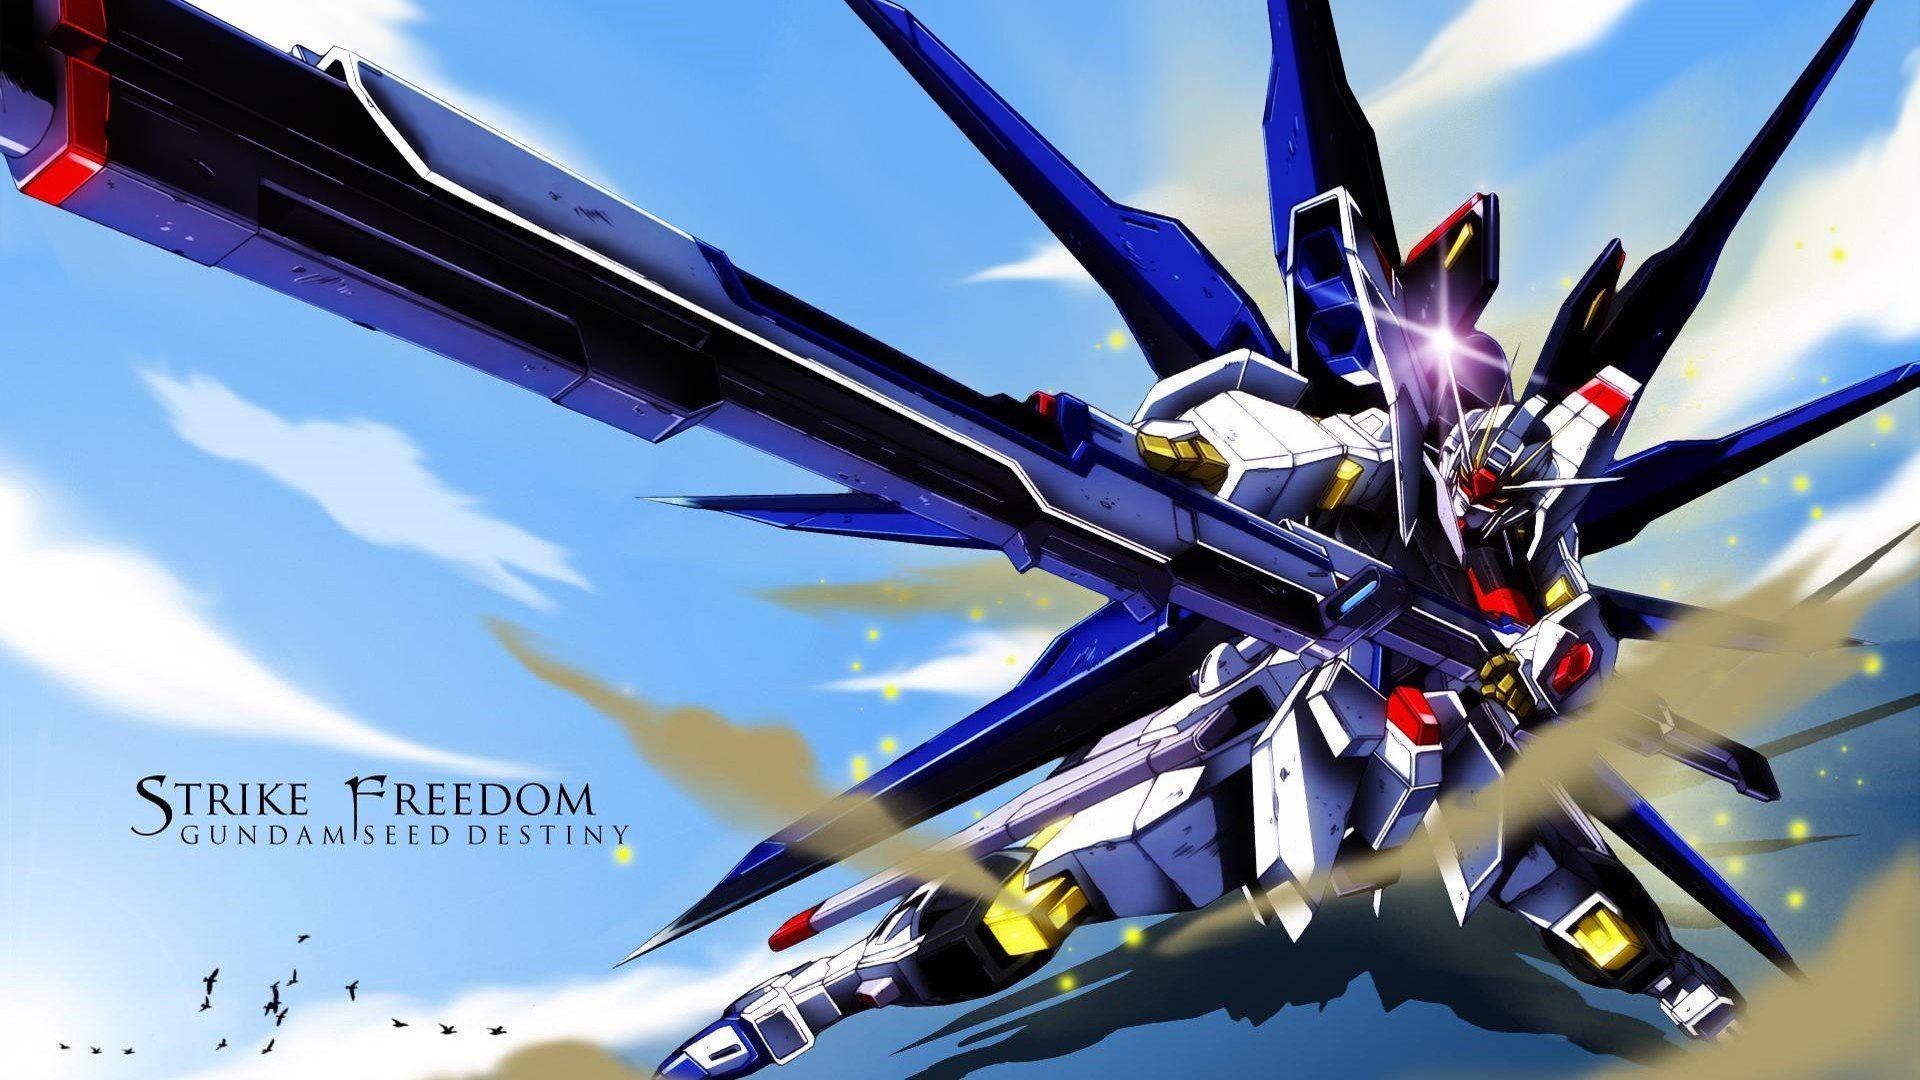 Gundam Seed Destiny Striker Freedom Gundam Zgmf X20a Strike Freedom Mobile Suit Gundam Seed Mobile Su Gundam Wallpapers Gundam Seed Destiny Wallpaper Hd